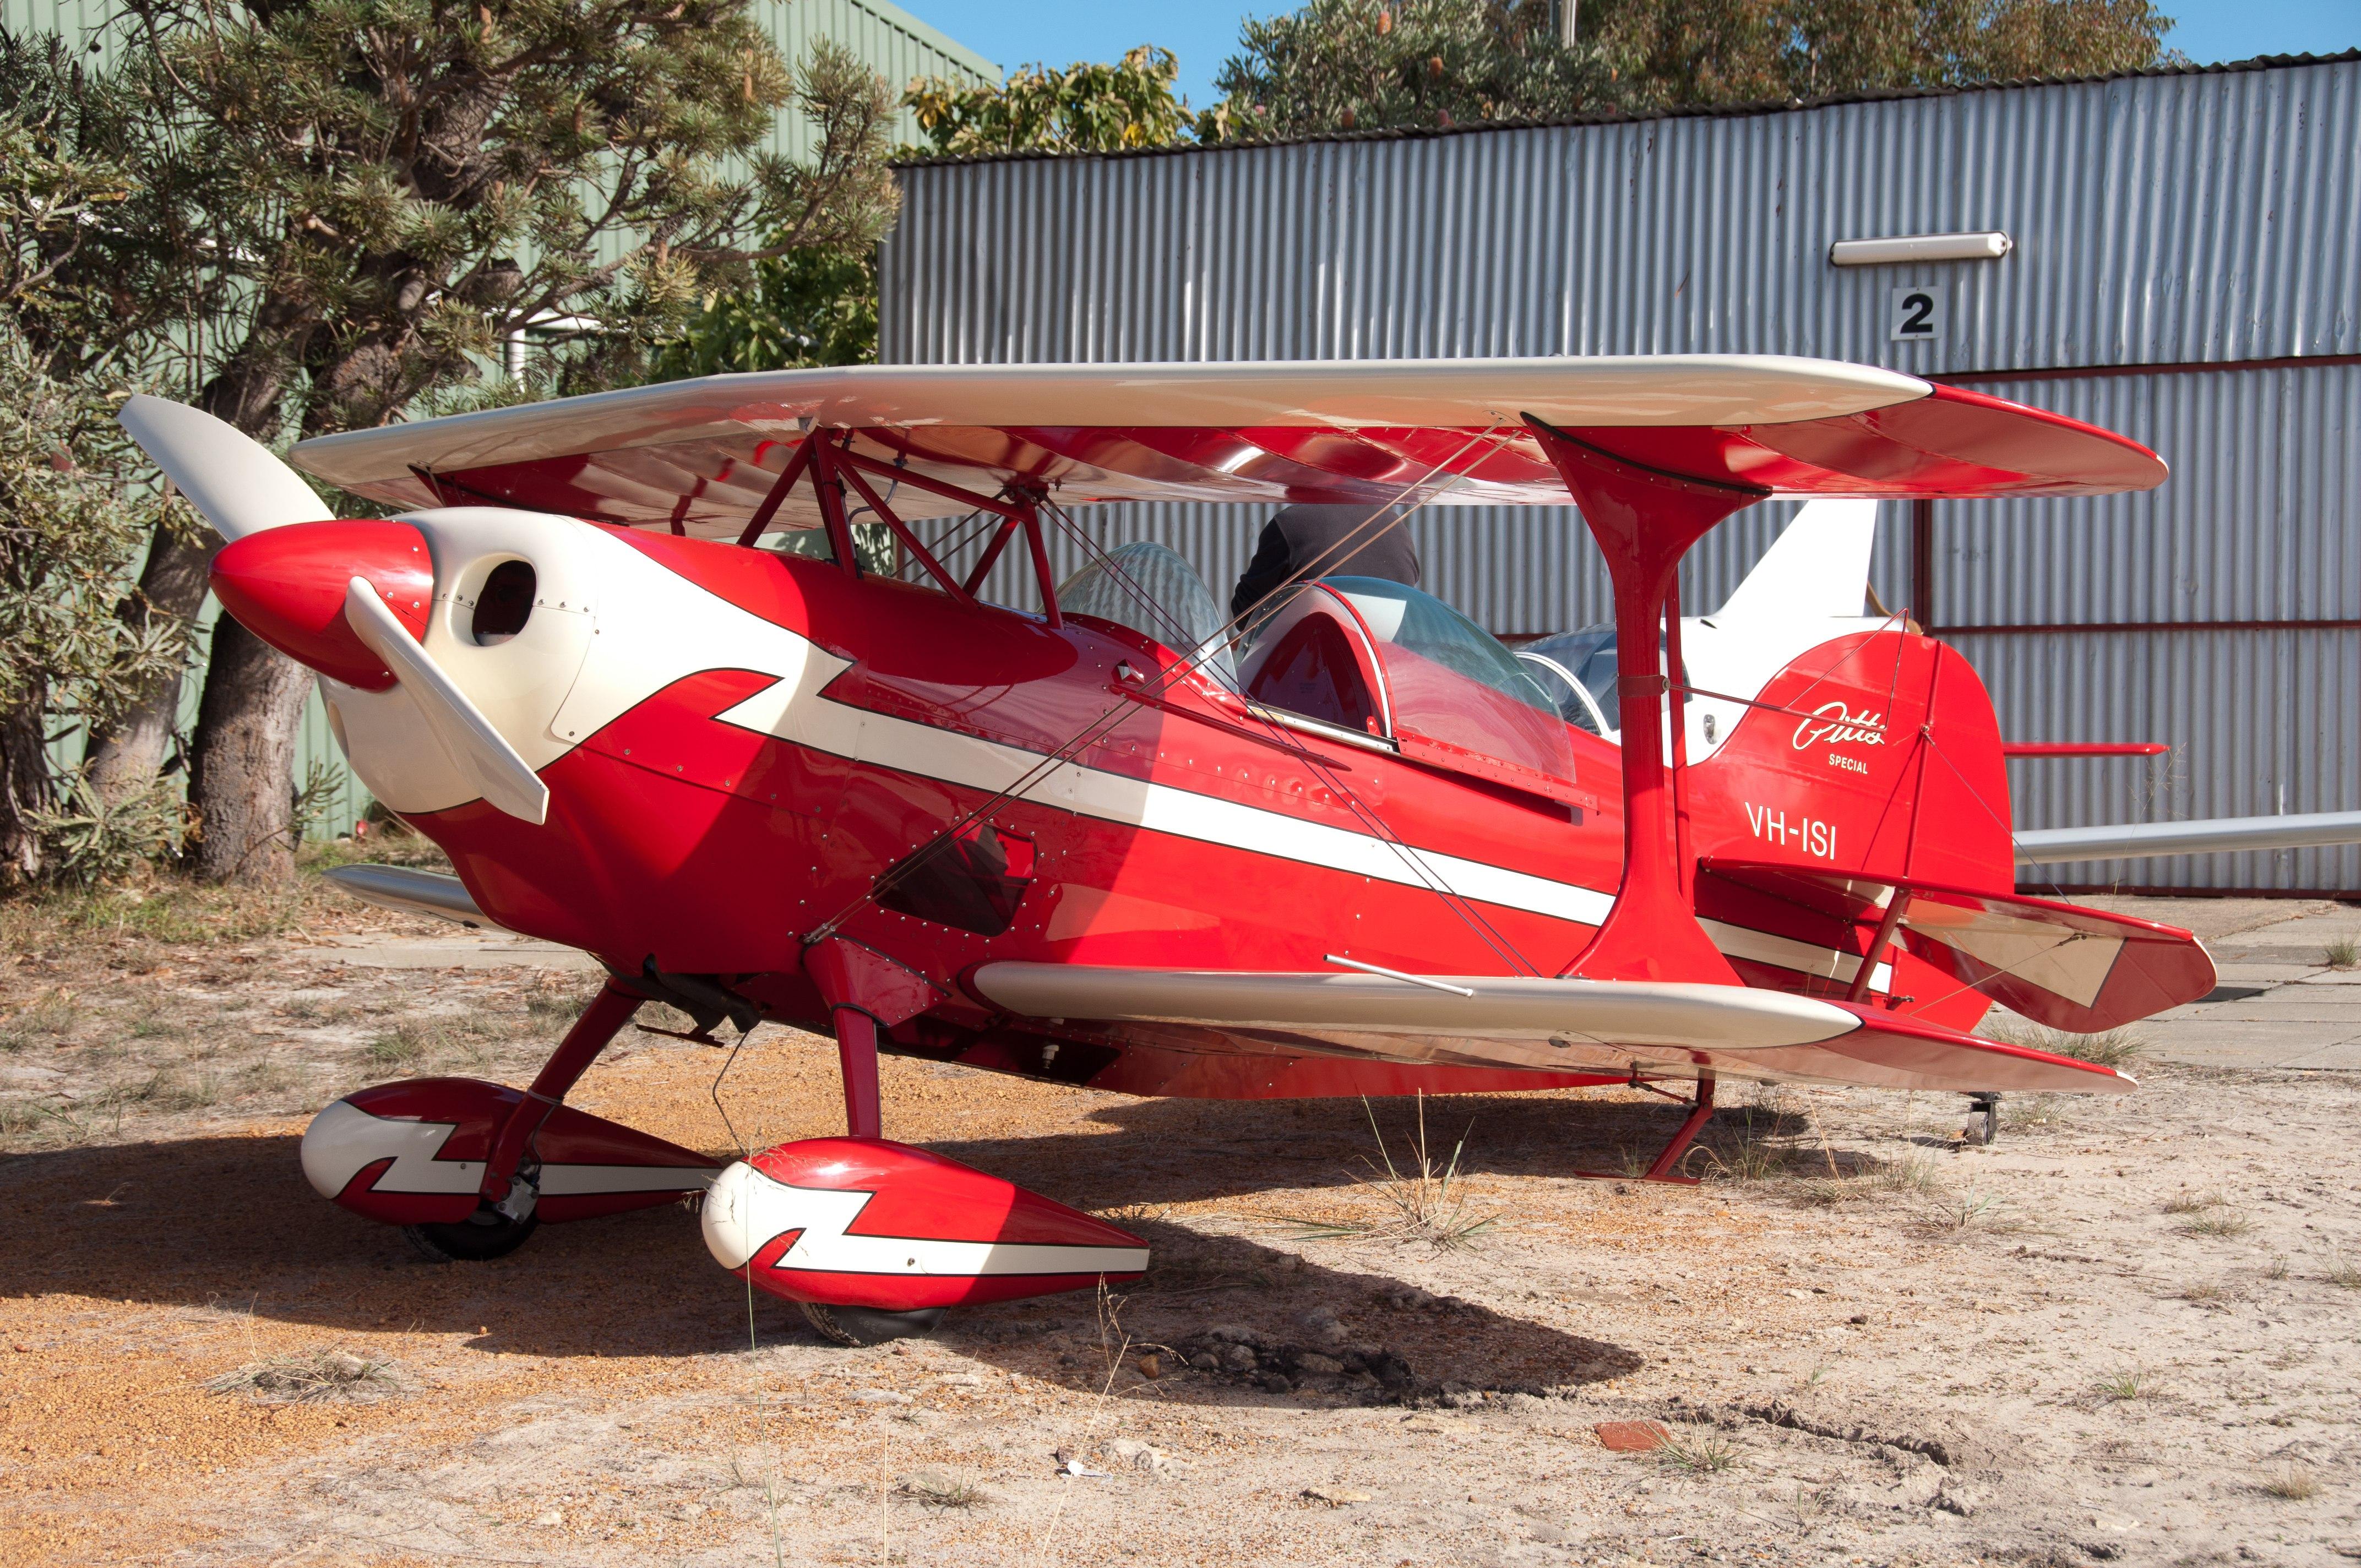 Serpentine SABC SAAA fly in aviation ufc uni flying club jandakot pitts special aerobatics